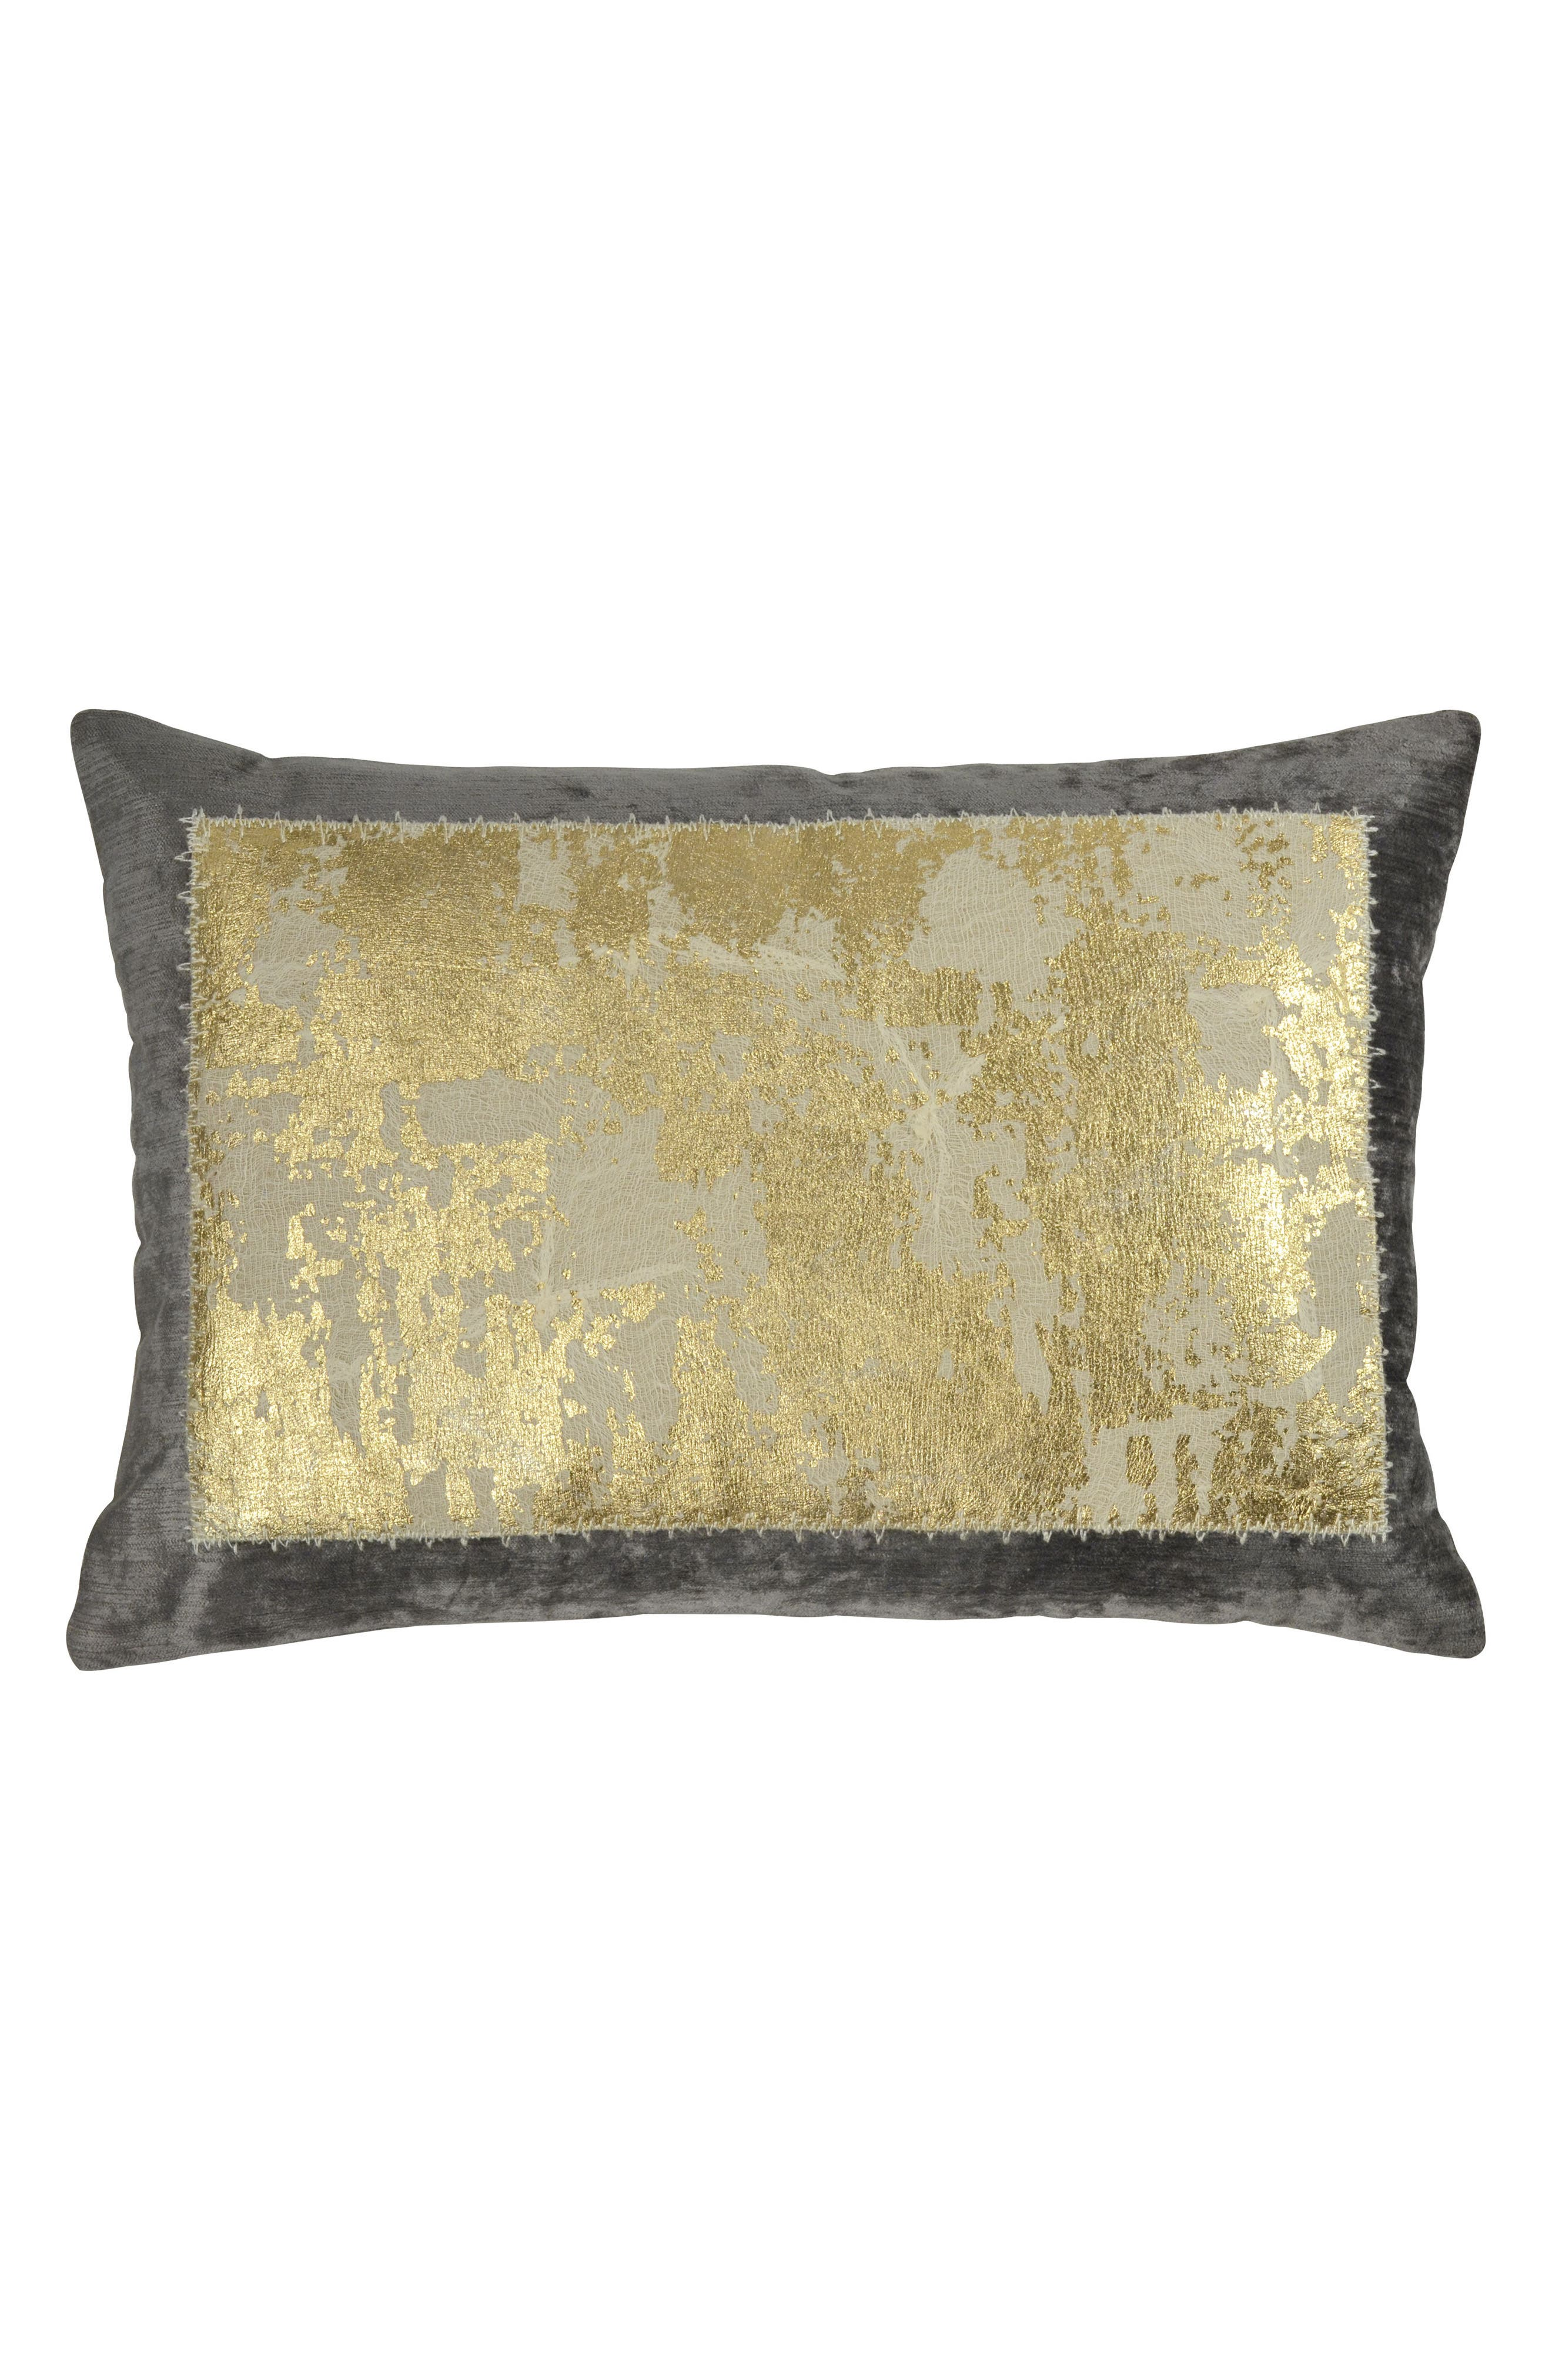 michael aram distressed metallic accent pillow